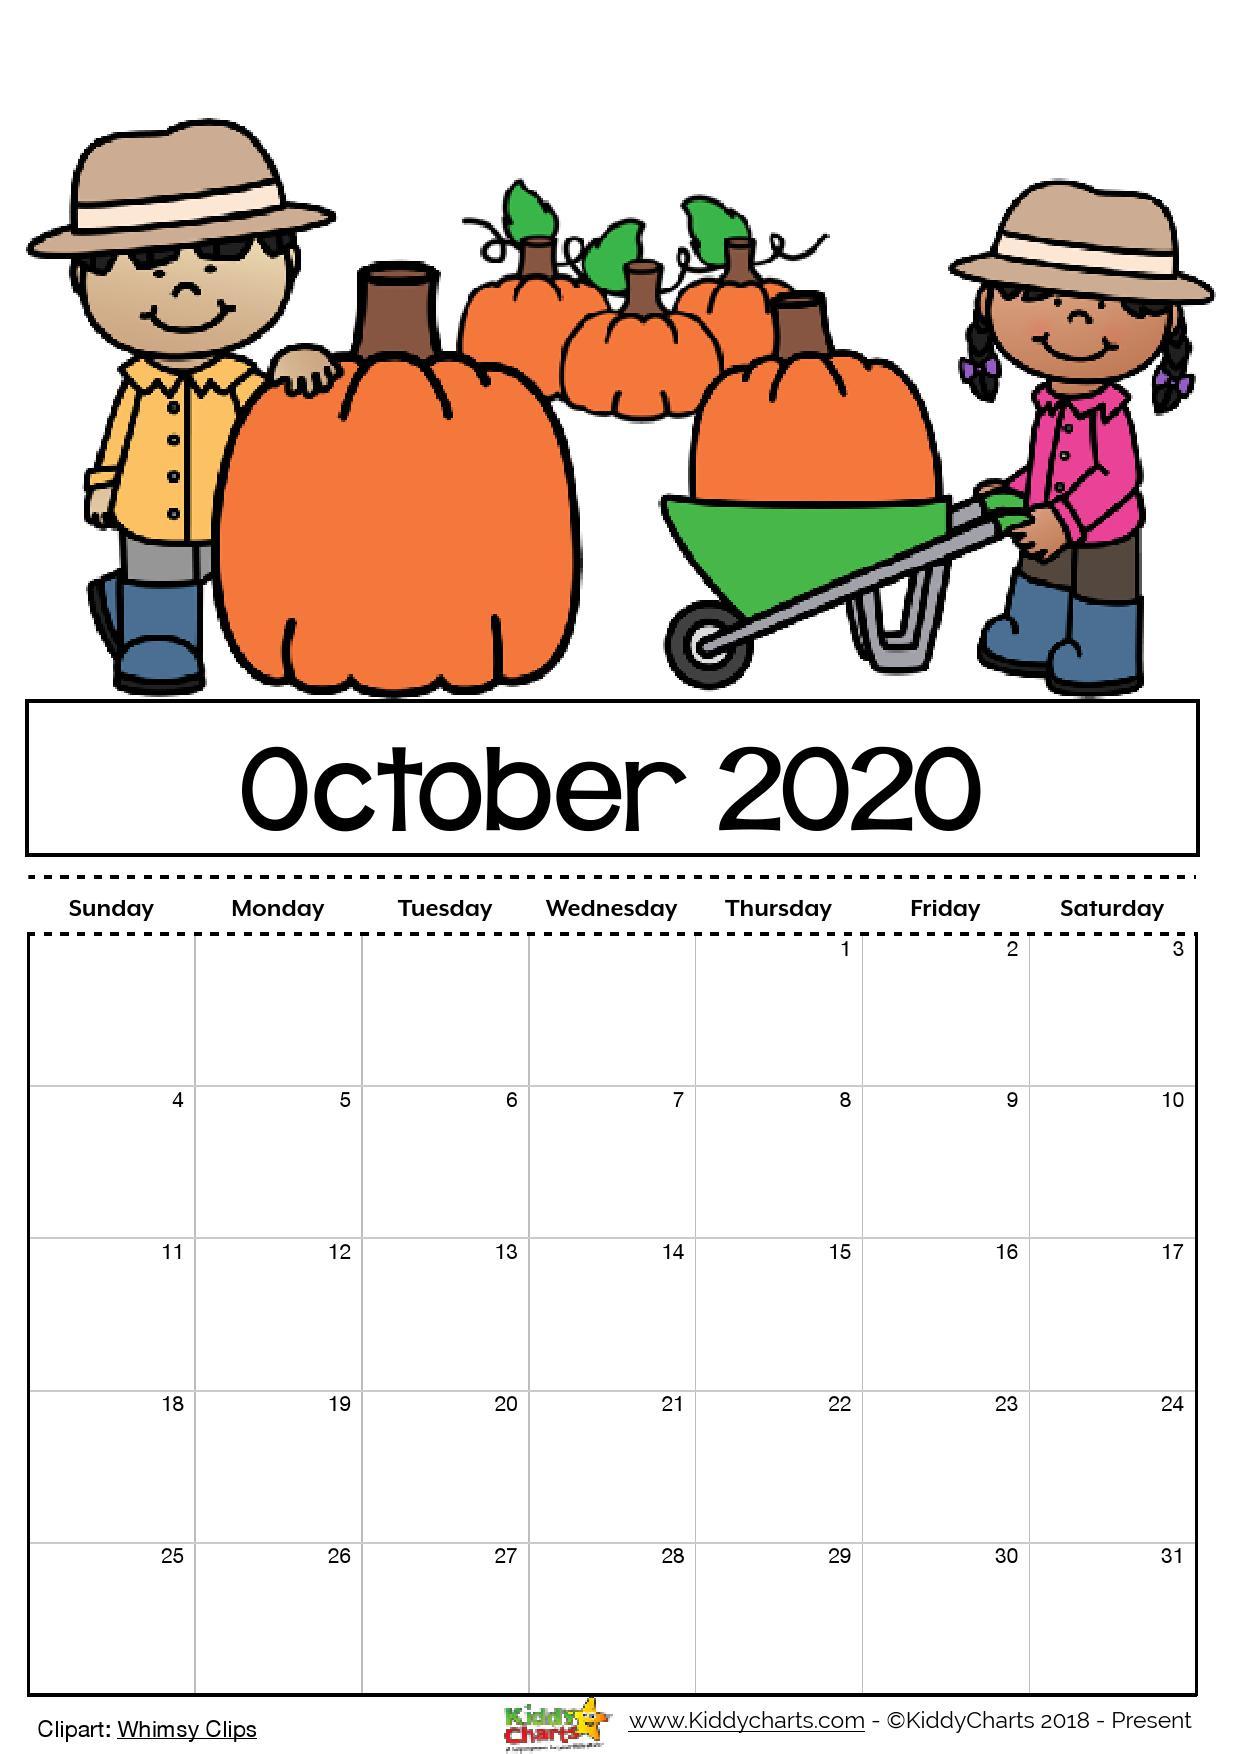 Free Printable 2020 Calendar For Kids, Including An Editable